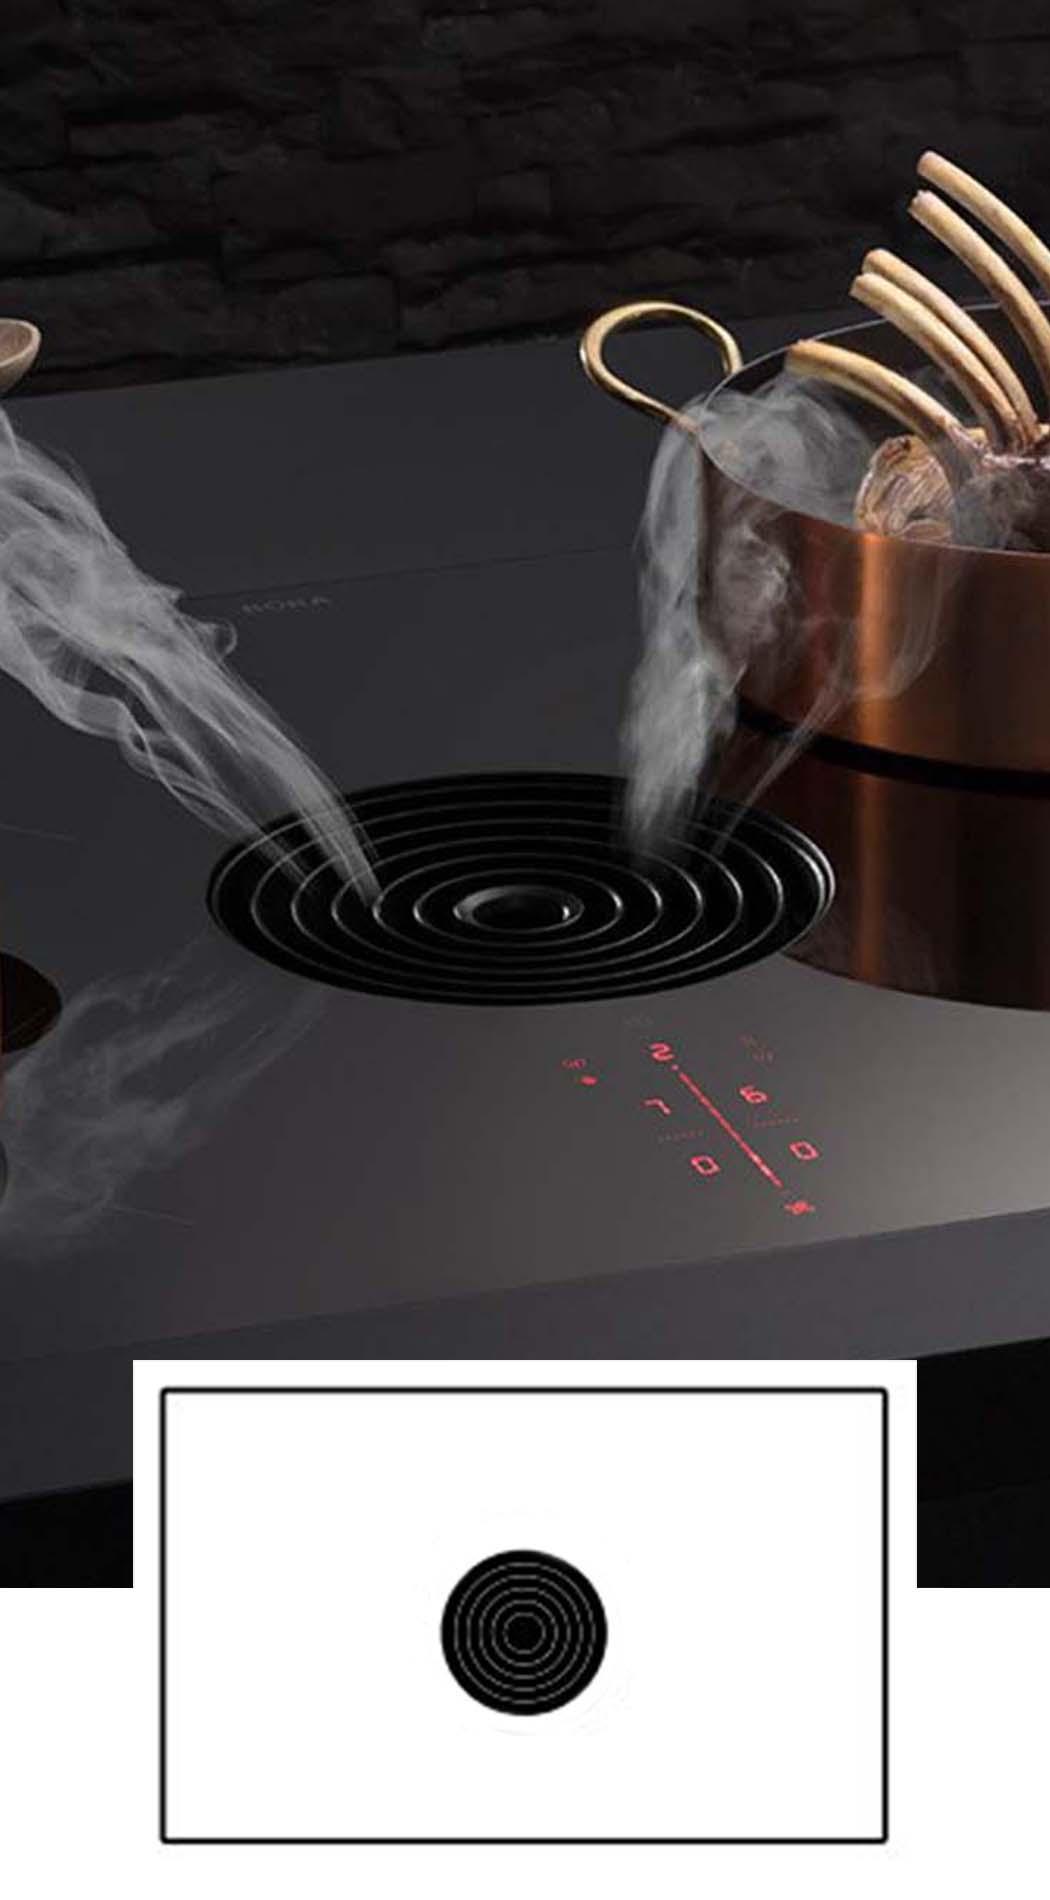 BORA Pure - BORA kookplaat met afzuiging, ASWA Keukens